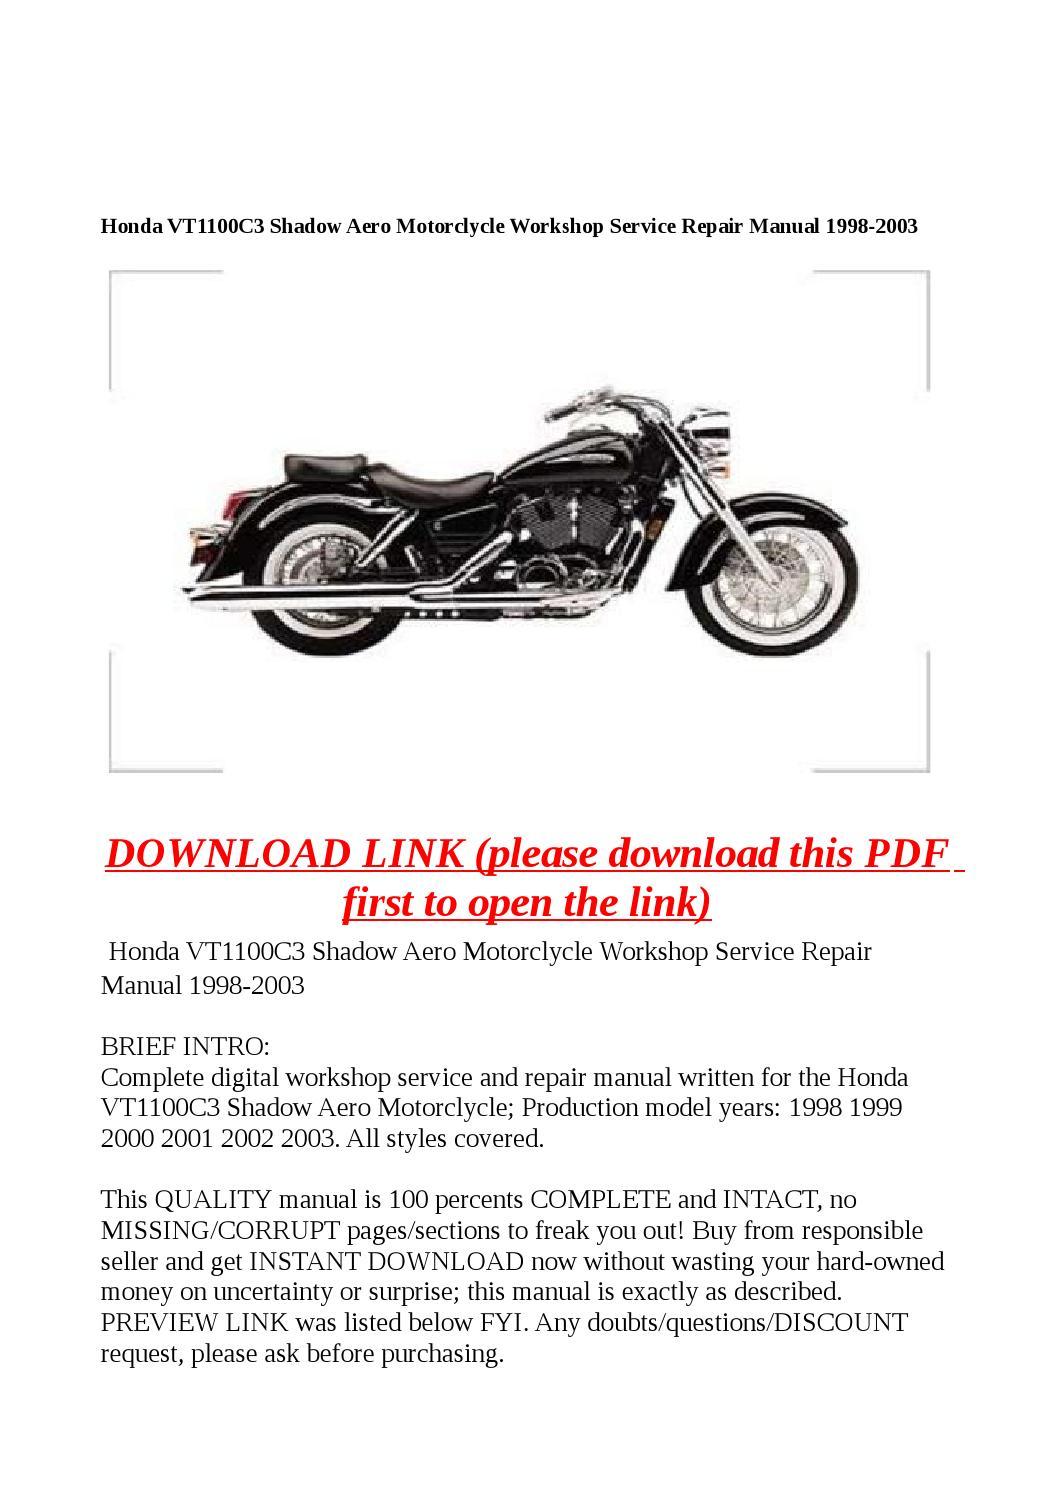 honda vt1100c3 shadow aero motorclycle workshop service. Black Bedroom Furniture Sets. Home Design Ideas